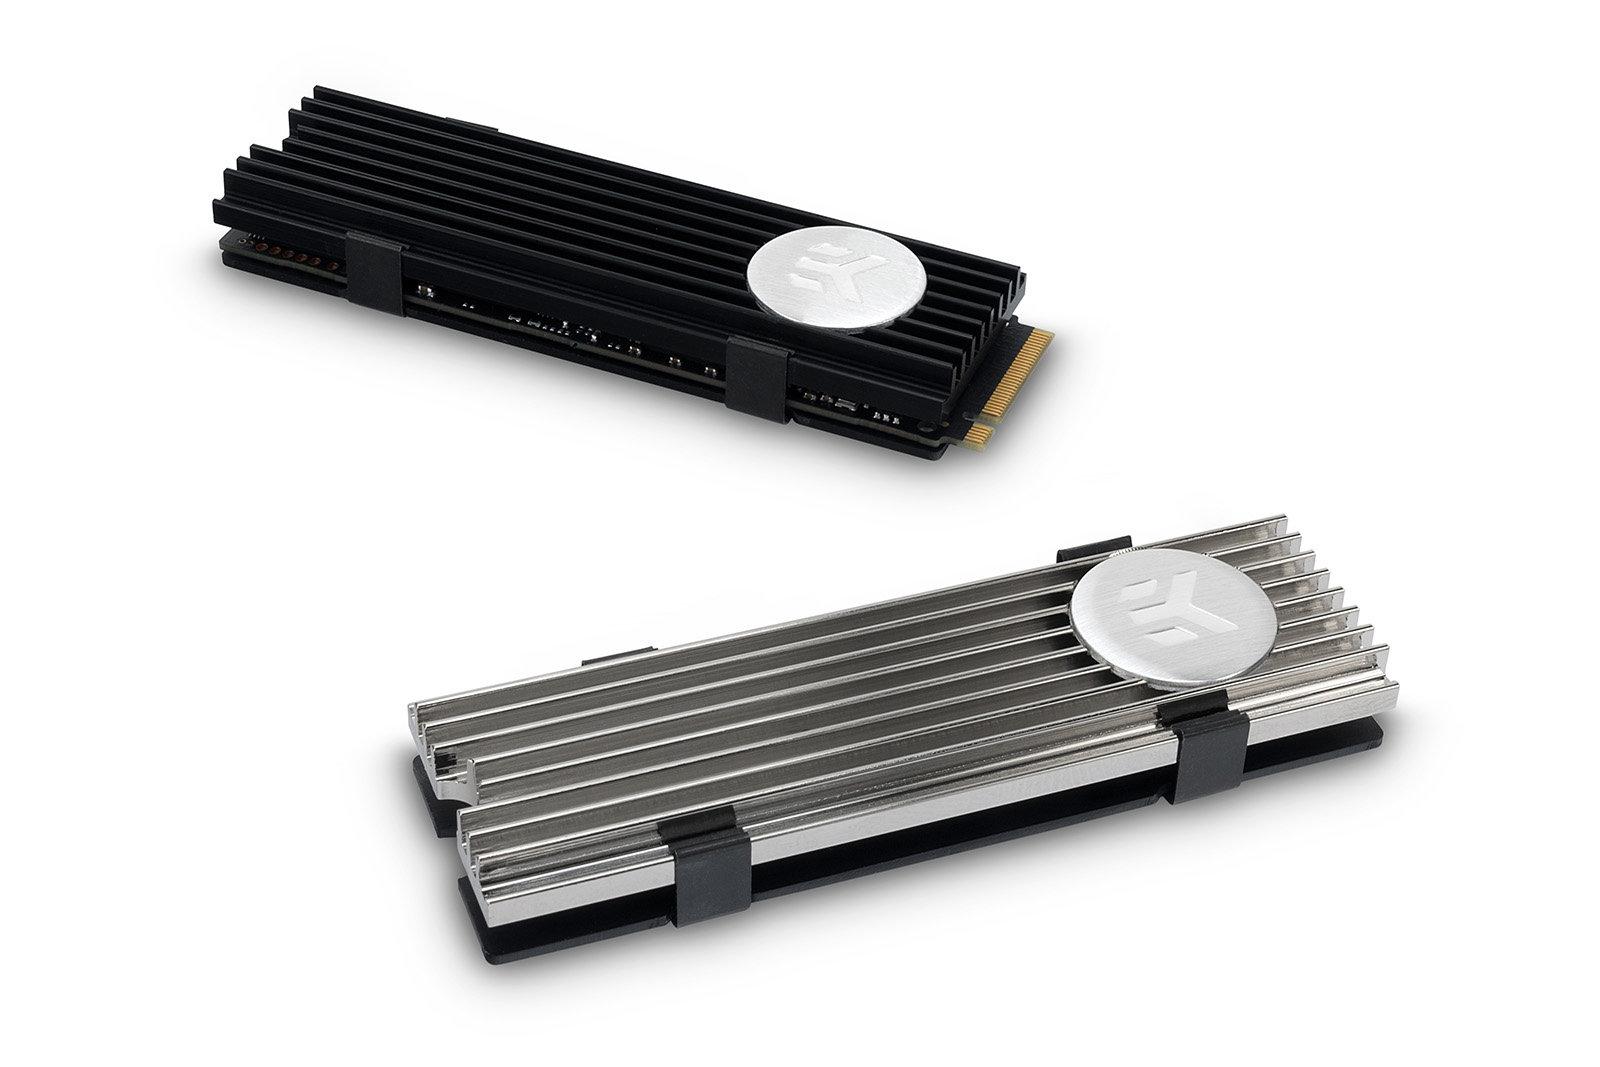 EK-M.2 NVMe Heatsink: M.2-SSD-Kühler in schwarz und vernickelt